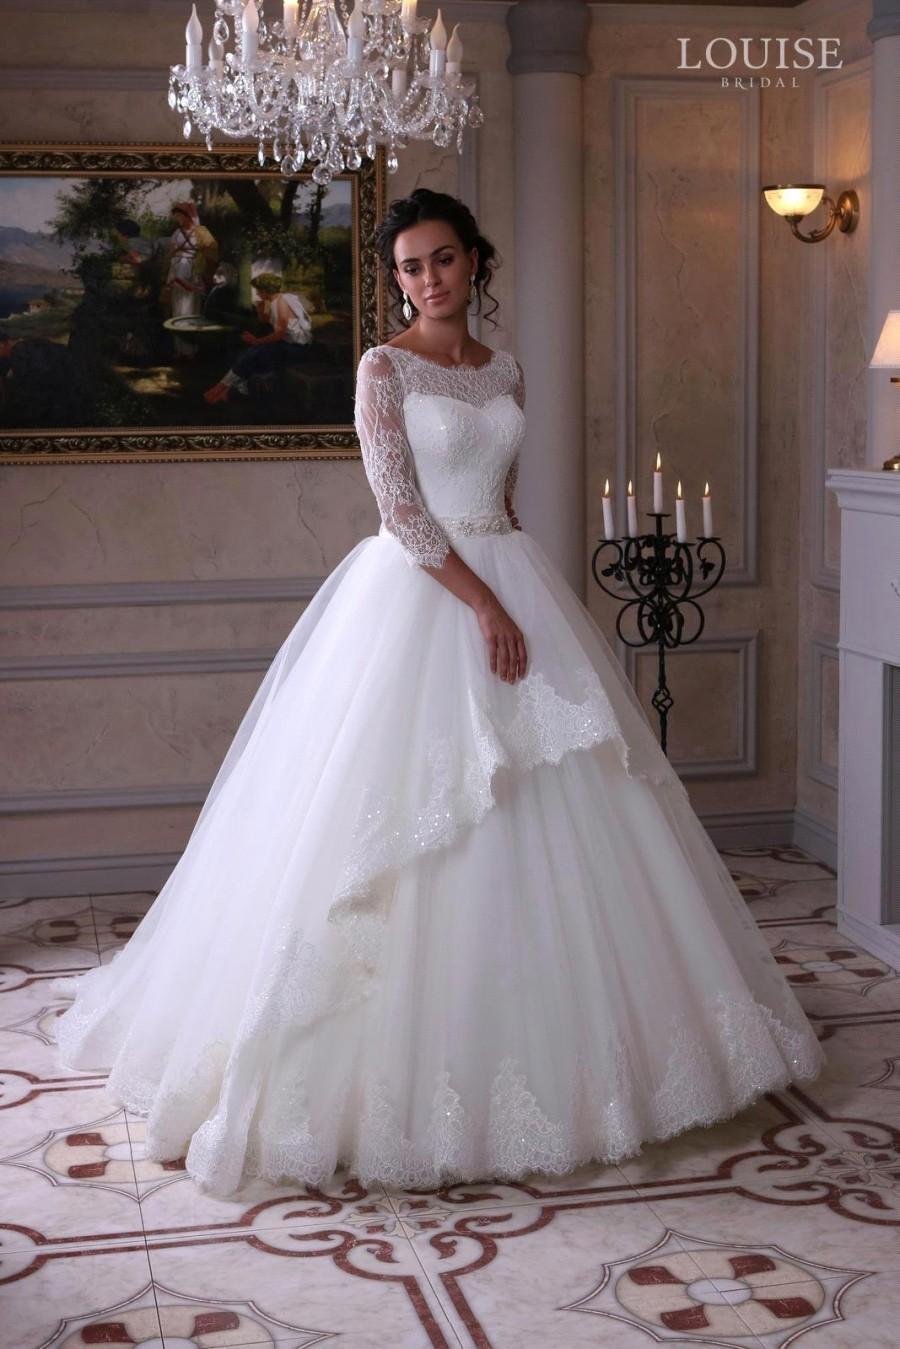 Vestido de noiva 2016 new 3 4 sleeve a line wedding 3 4 sleeve wedding dress a line